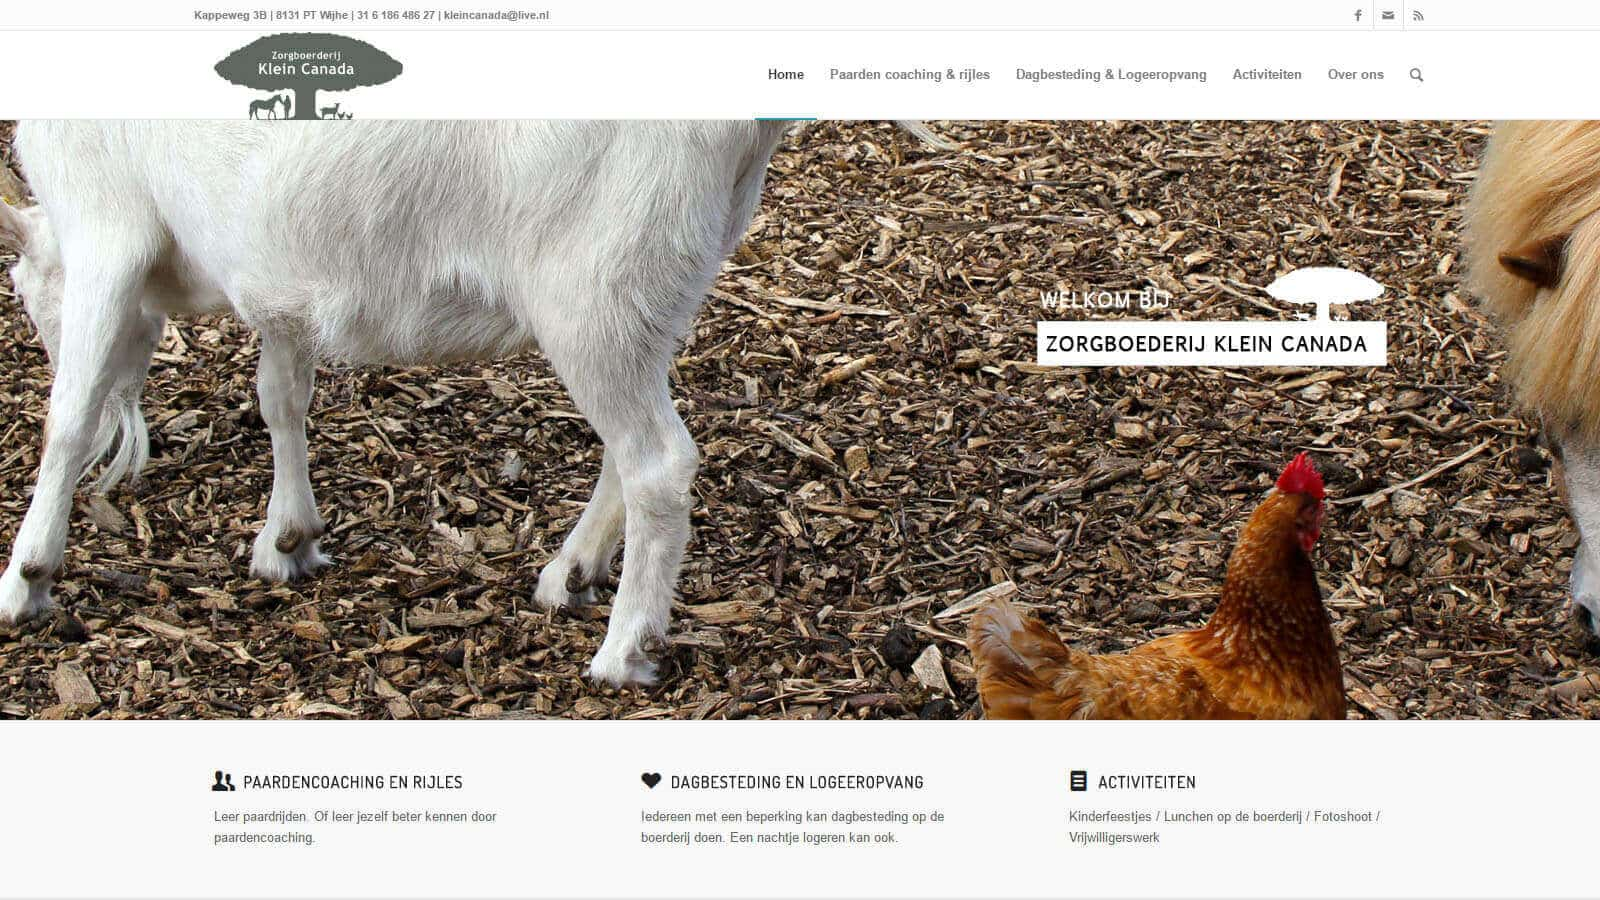 zorgboerderij klein canada website zorgboerderij klein canada - zorgboerderij - Zorgboerderij Klein Canada